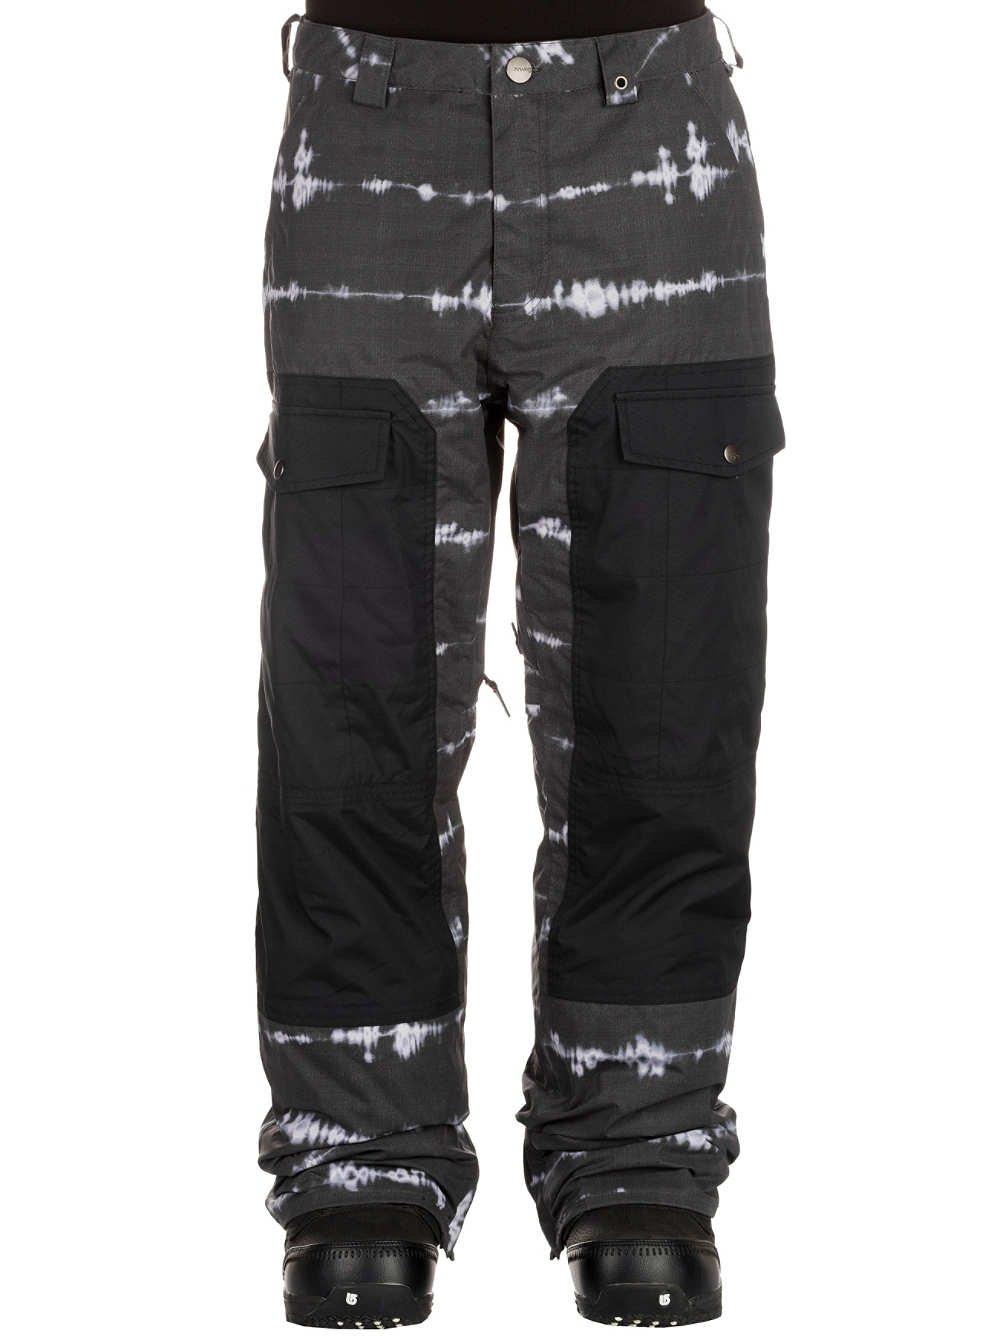 Herren Snowboard Hose Analog Abandon Pants